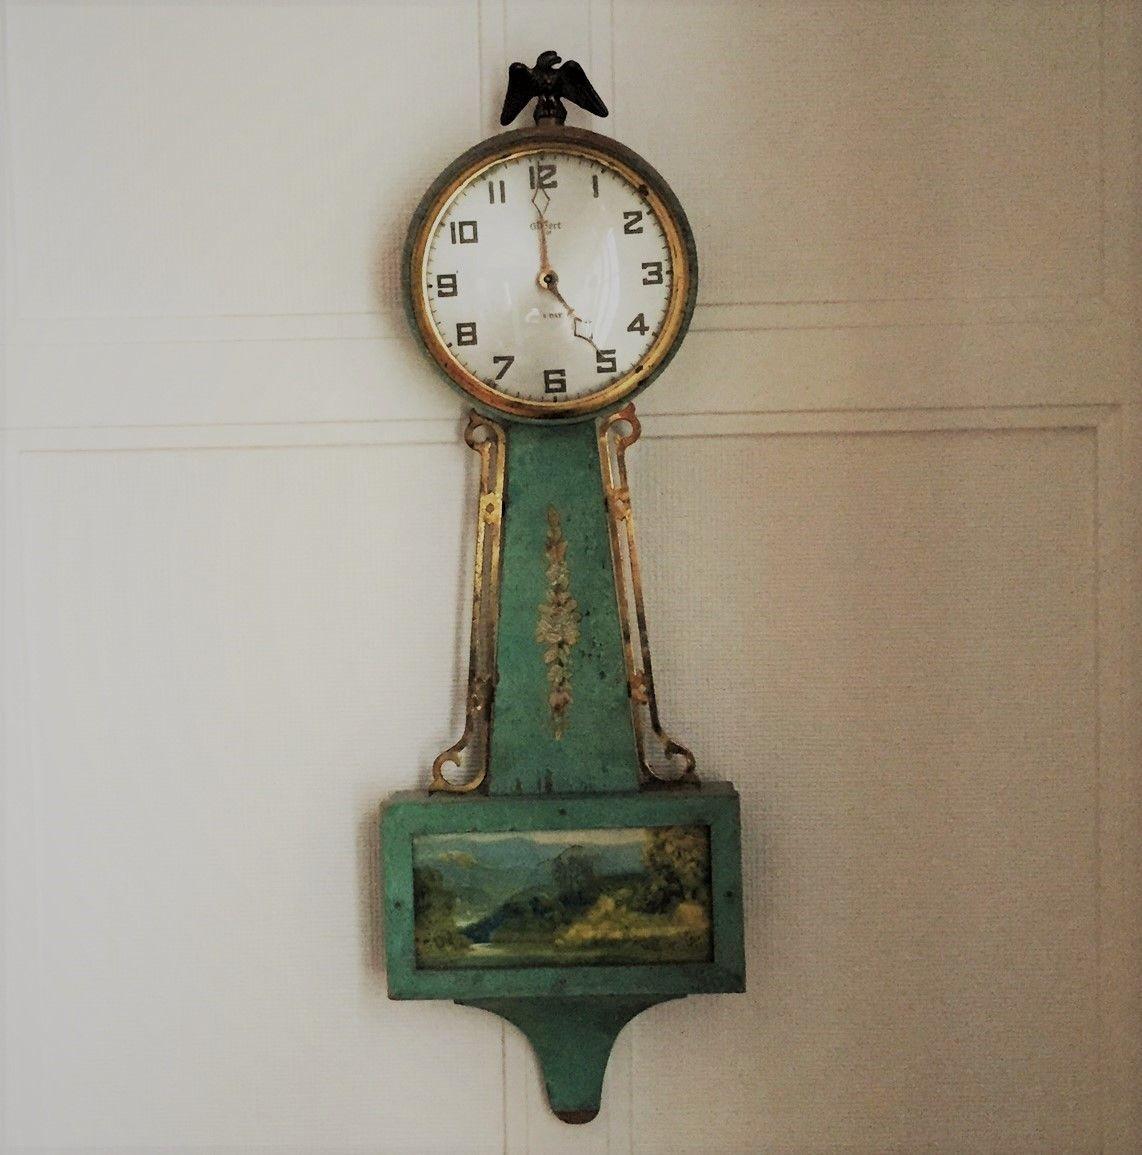 Antique Hand Painted Gilbert Banjo Clock Antiques Clock Antique Wall Clock